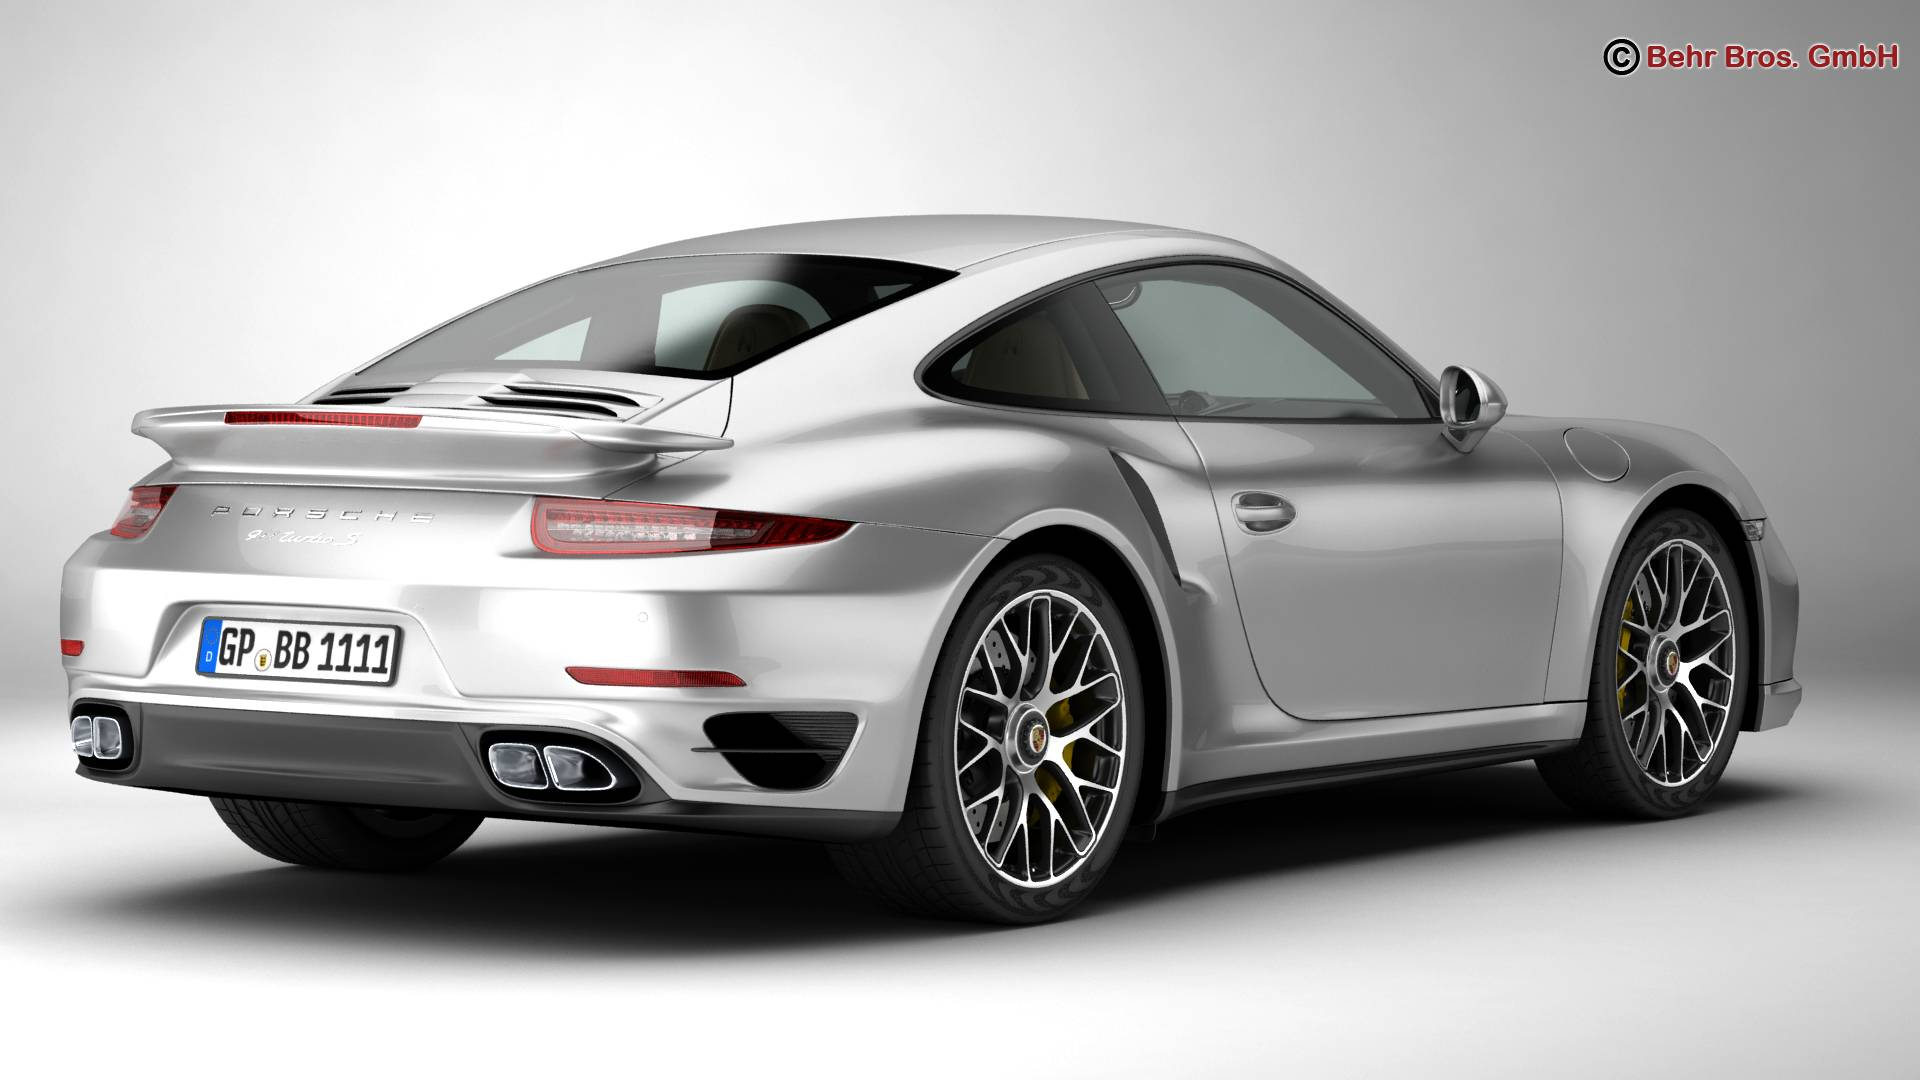 porsche 911 turbo s 2014 3d model buy porsche 911 turbo s 2014 3d model flatpyramid. Black Bedroom Furniture Sets. Home Design Ideas